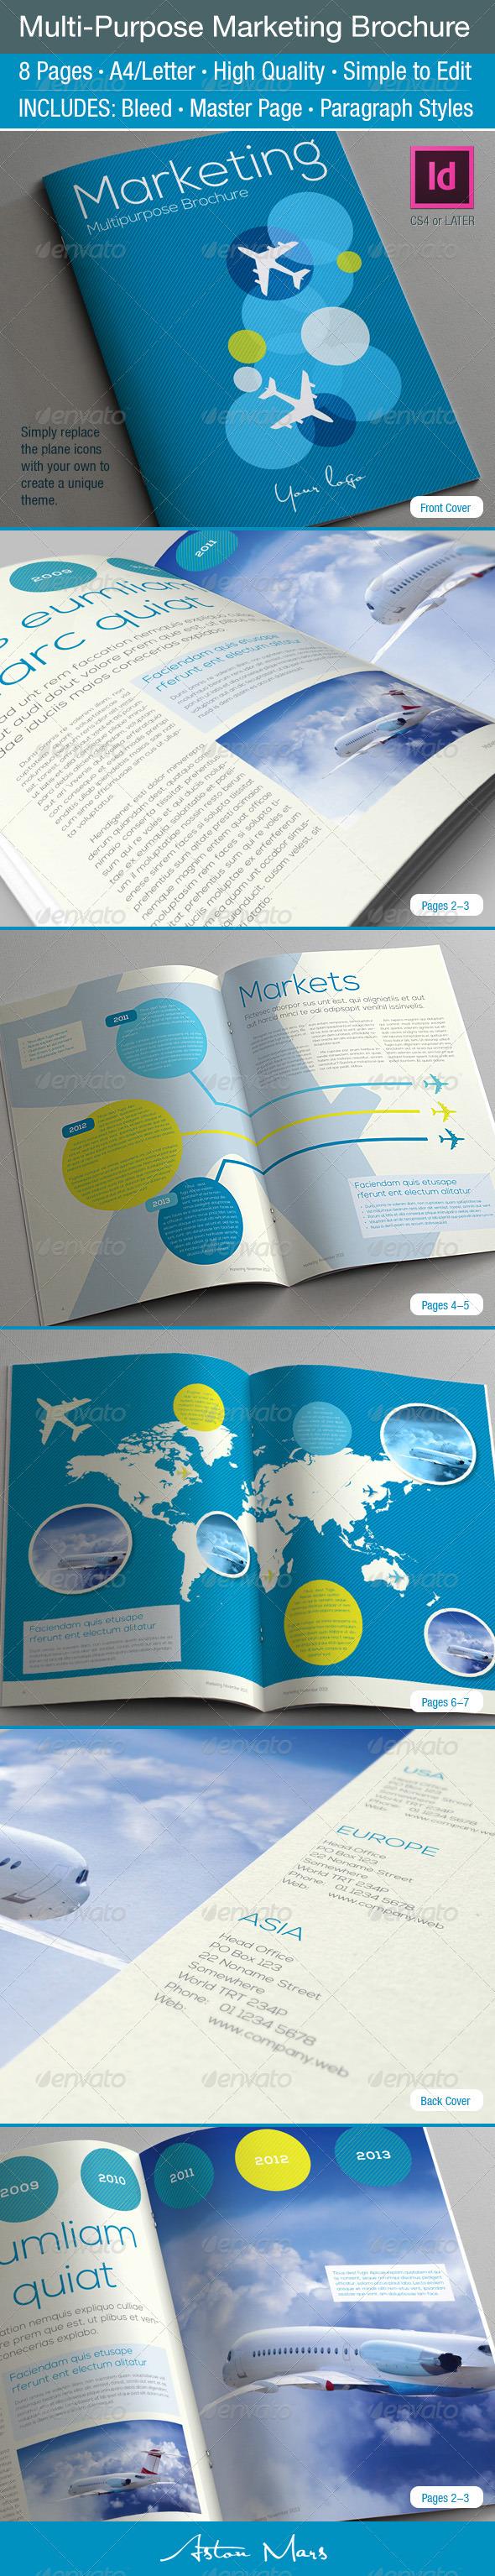 Multi-Purpose Marketing Brochure - Informational Brochures